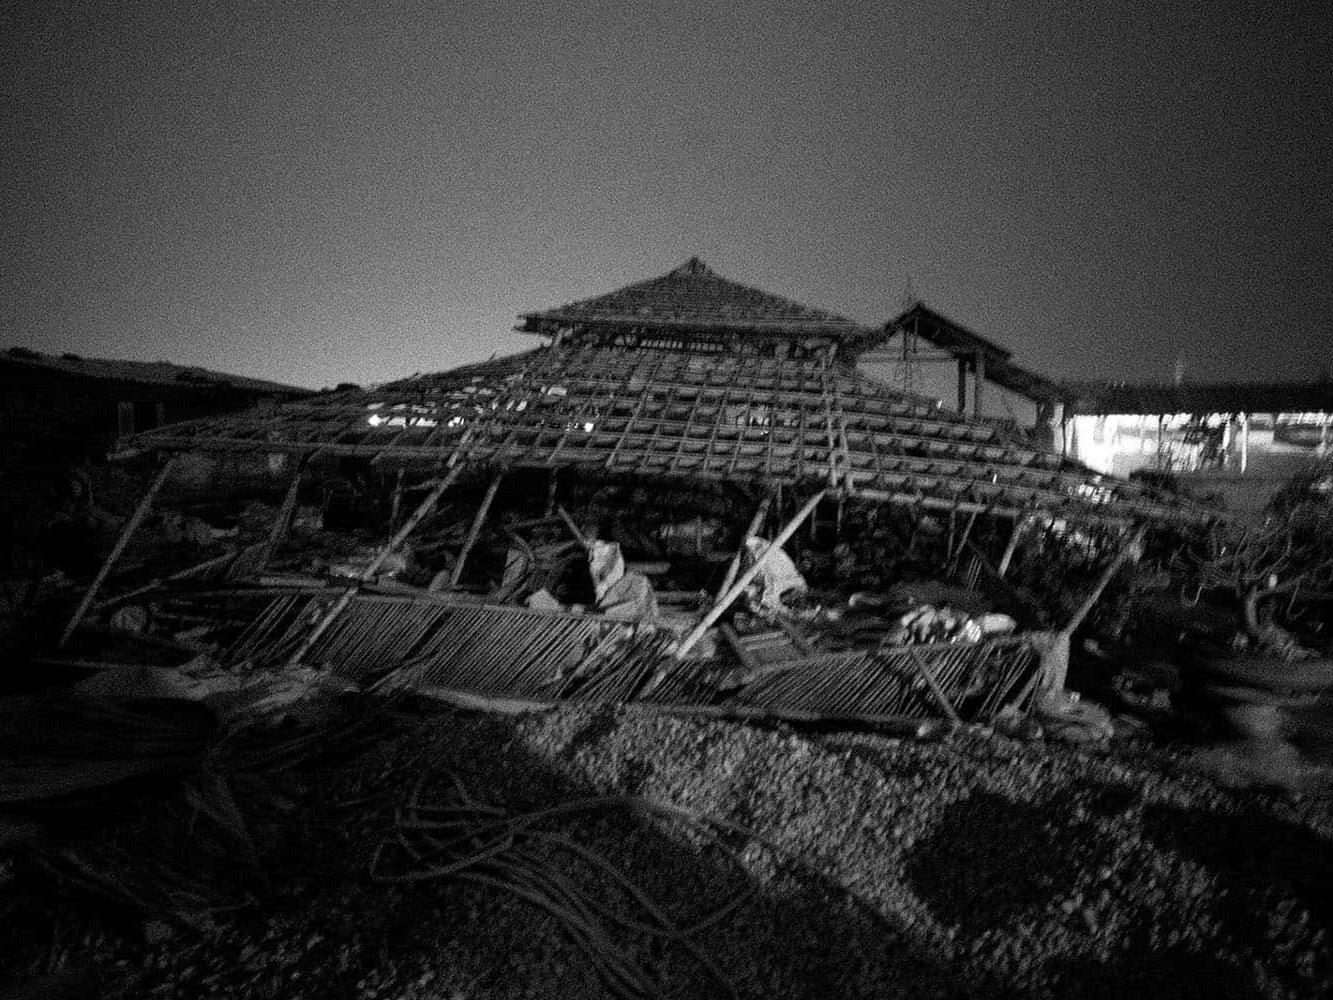 vietnam photographer smallthings binhdang 1